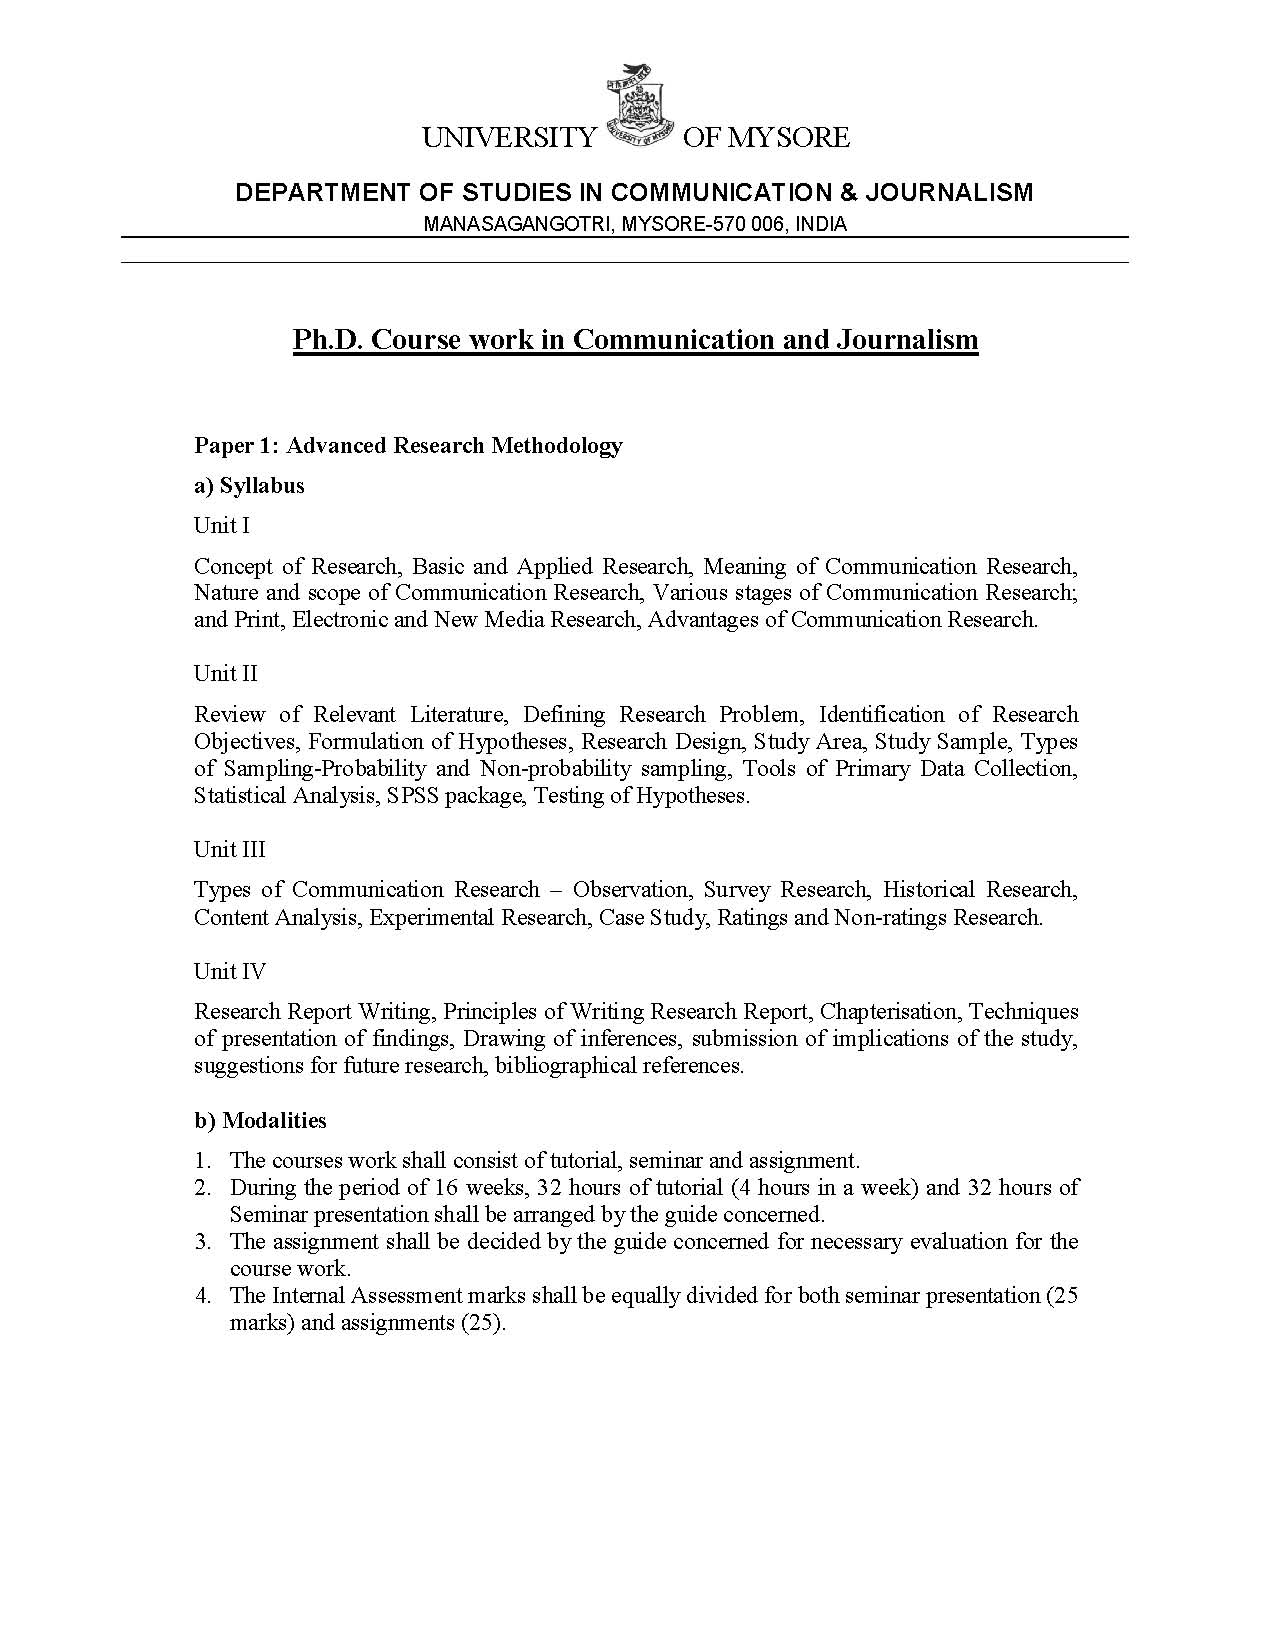 mysore university phd coursework syllabus